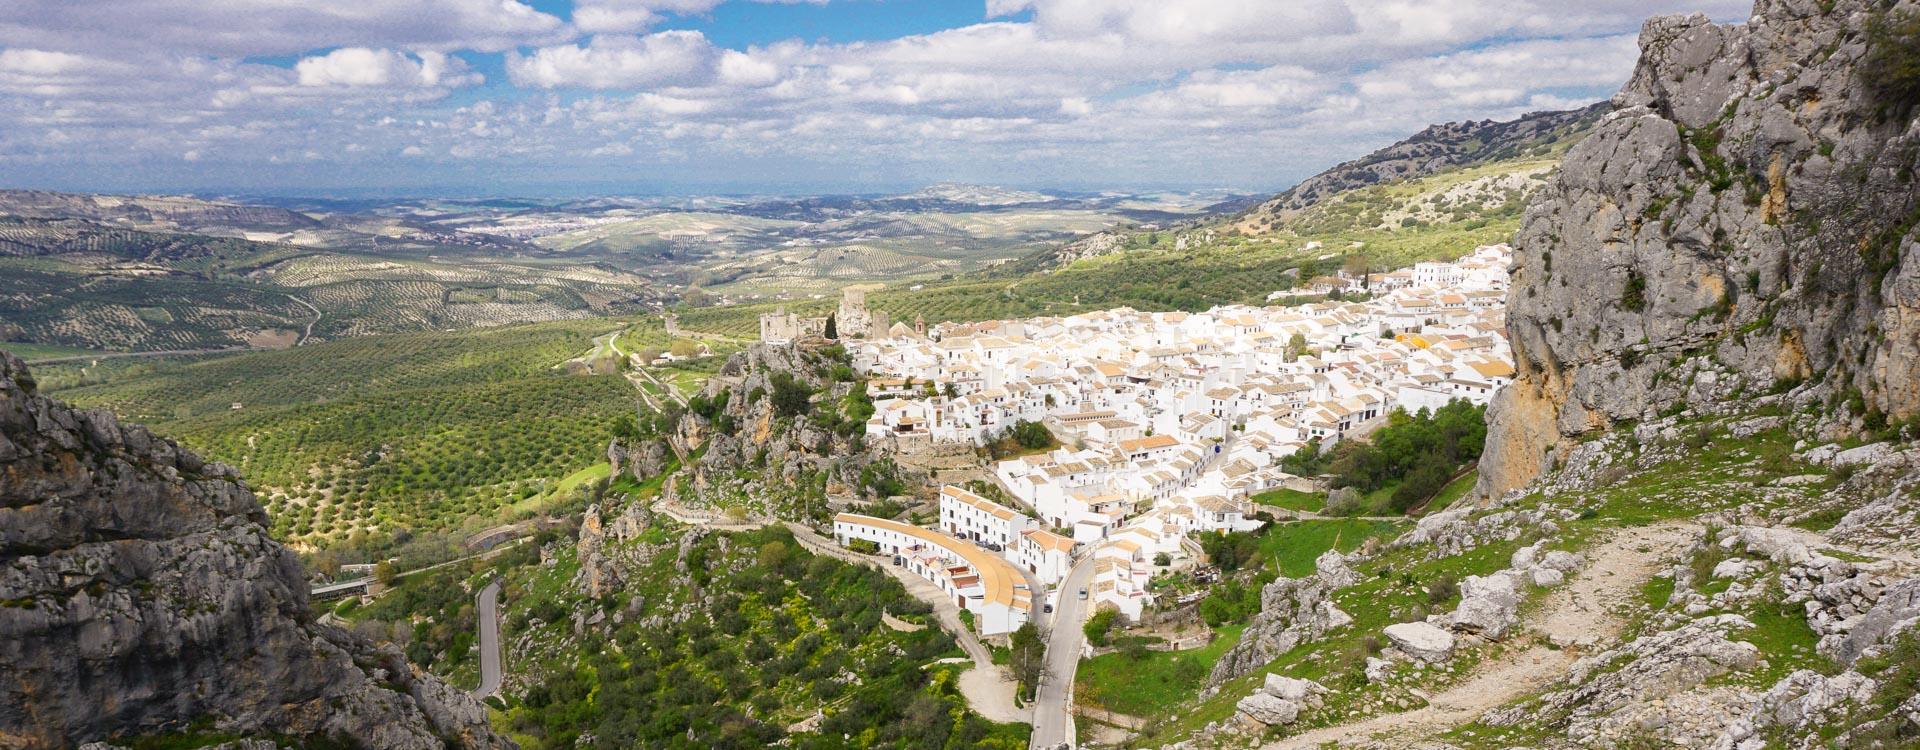 Andalusien Sehenswürdigkeiten: E-bike Reise Andalusien Zuheros